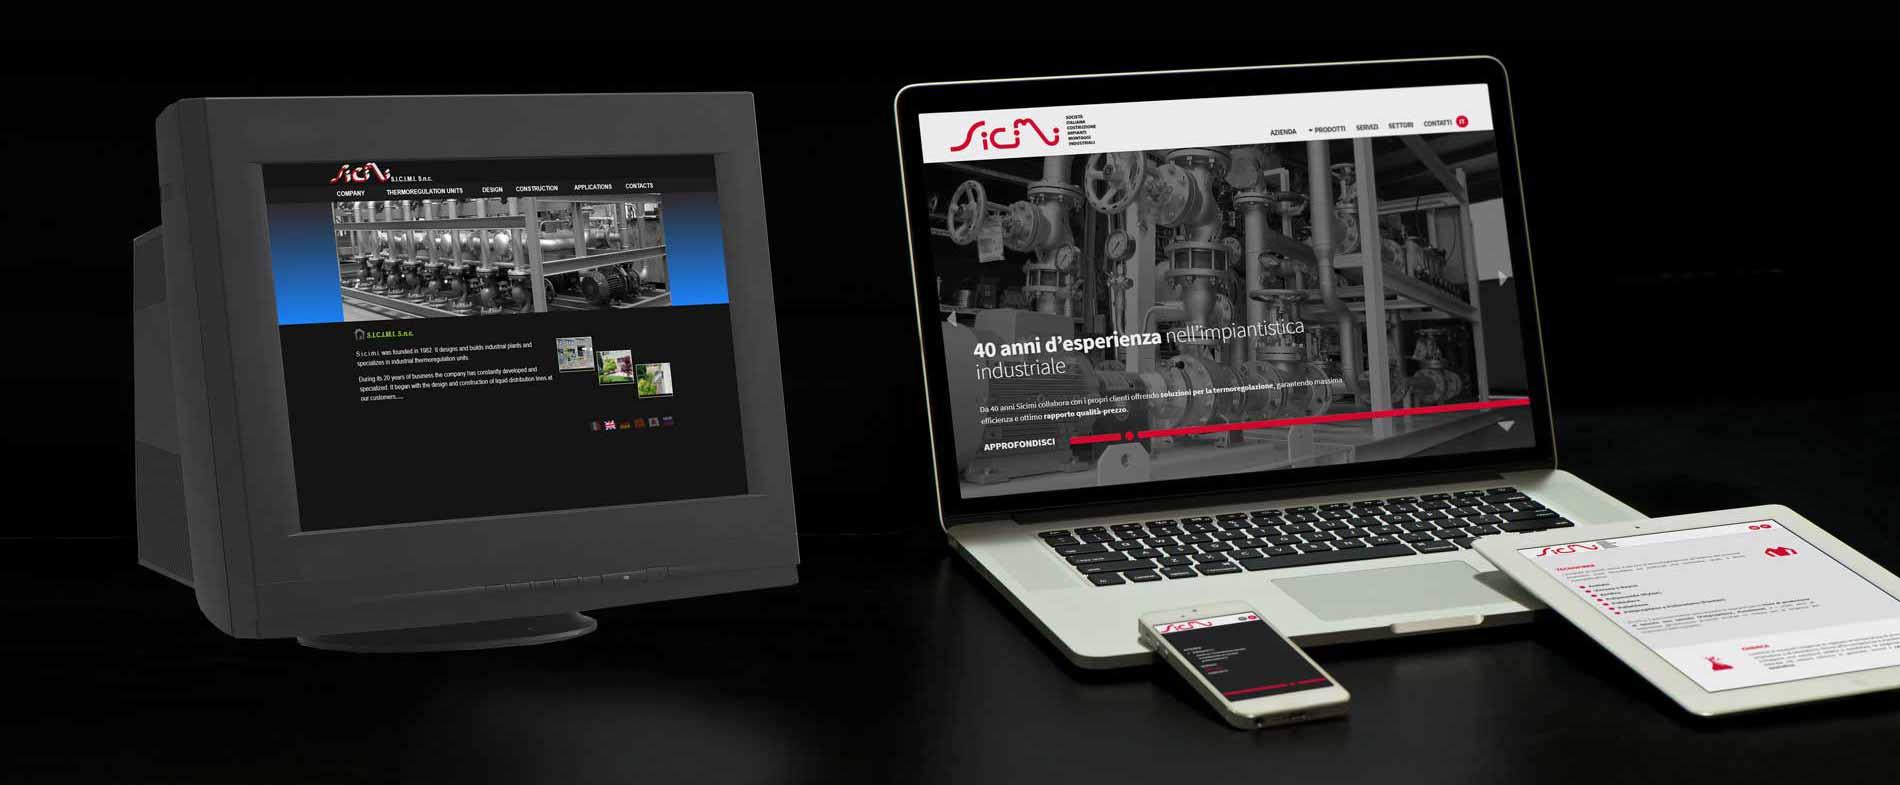 identity designer - modern web design